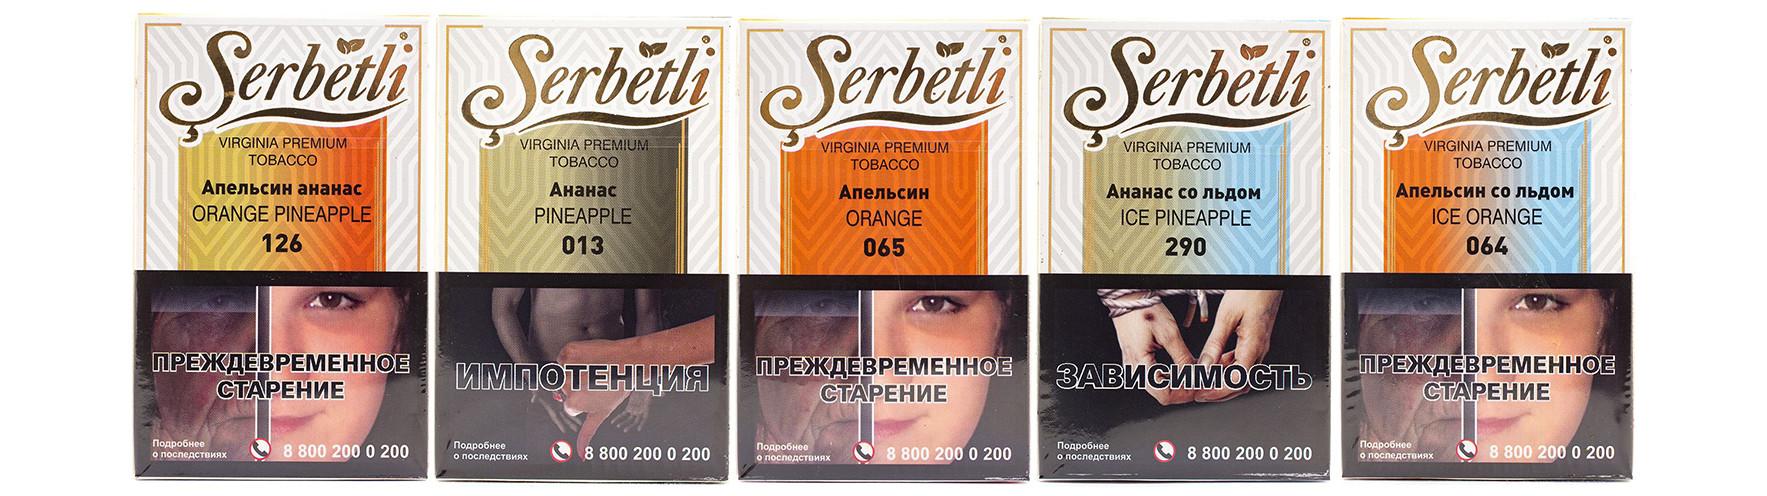 Табак для кальяна Serbetli (Щербетли)